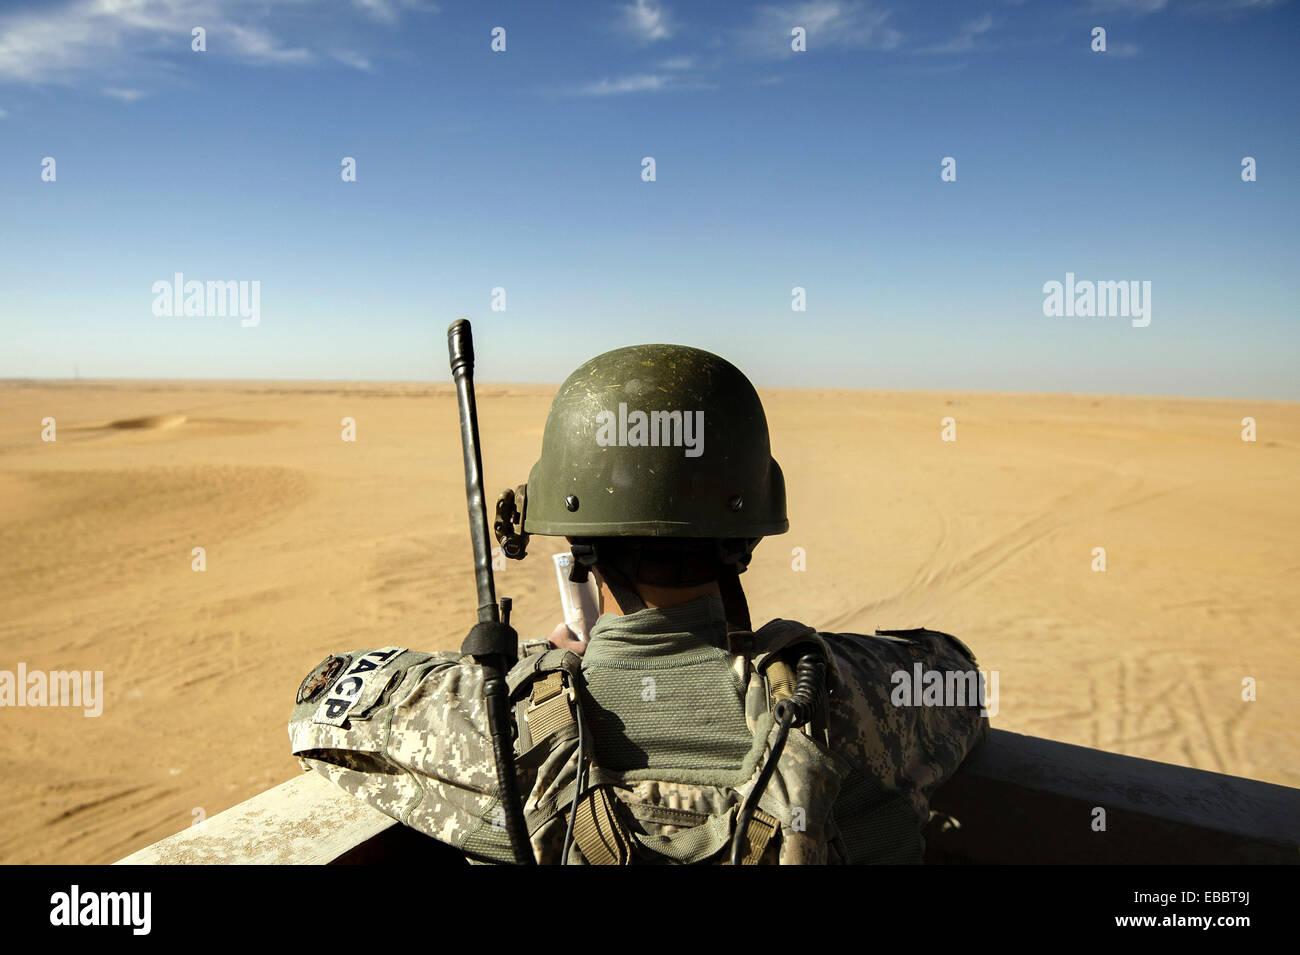 Senior Airman Justin Tamayo monitors incoming combat aircraft during a joint live-fire exercise Oct. 23, 2013, at - Stock Image